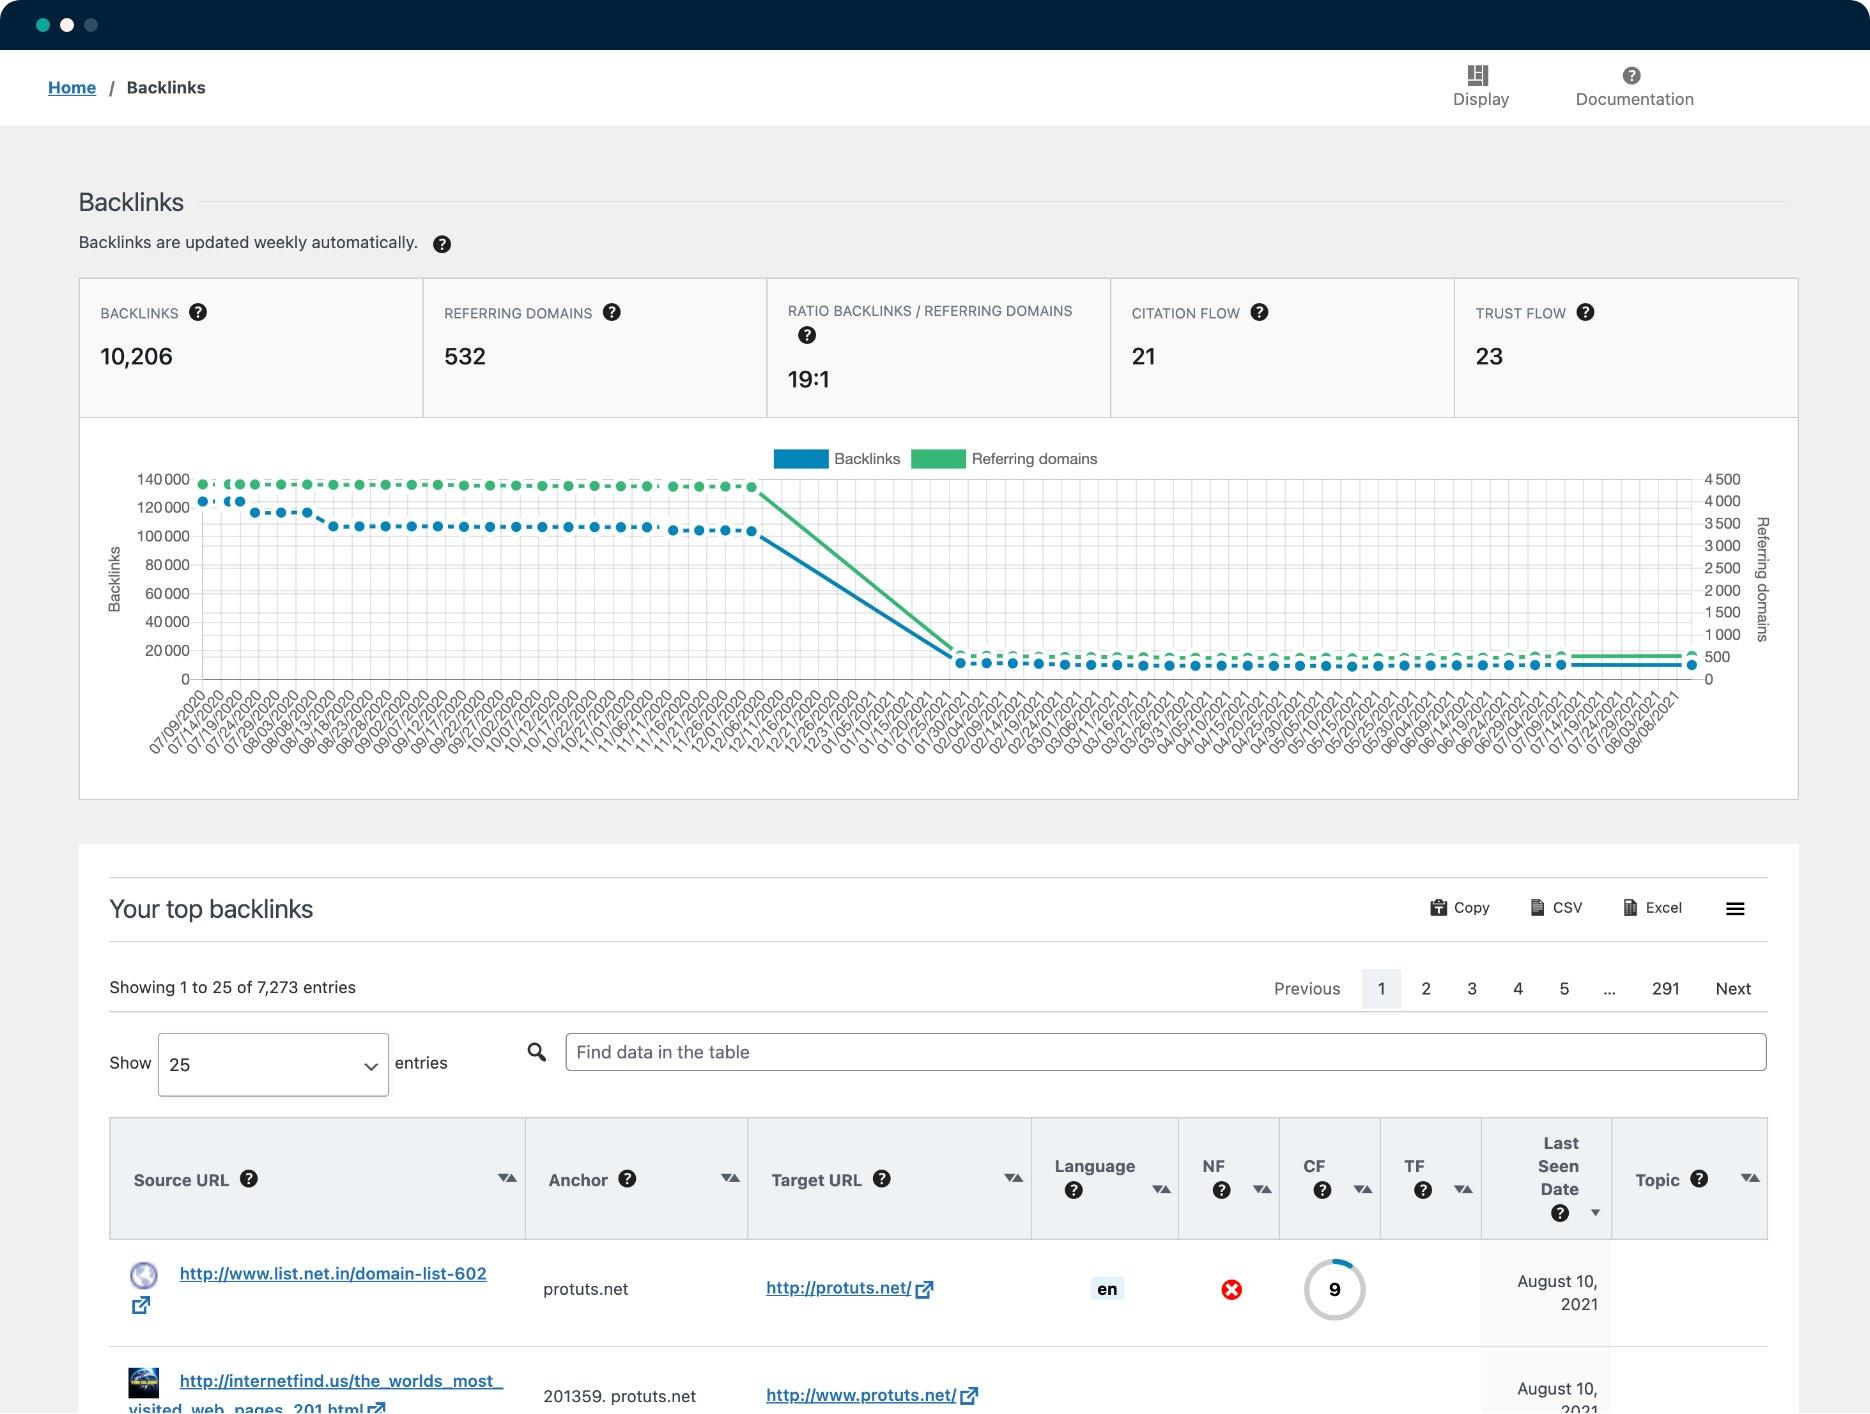 Monitoreo de backlinks - SEOPress Insights